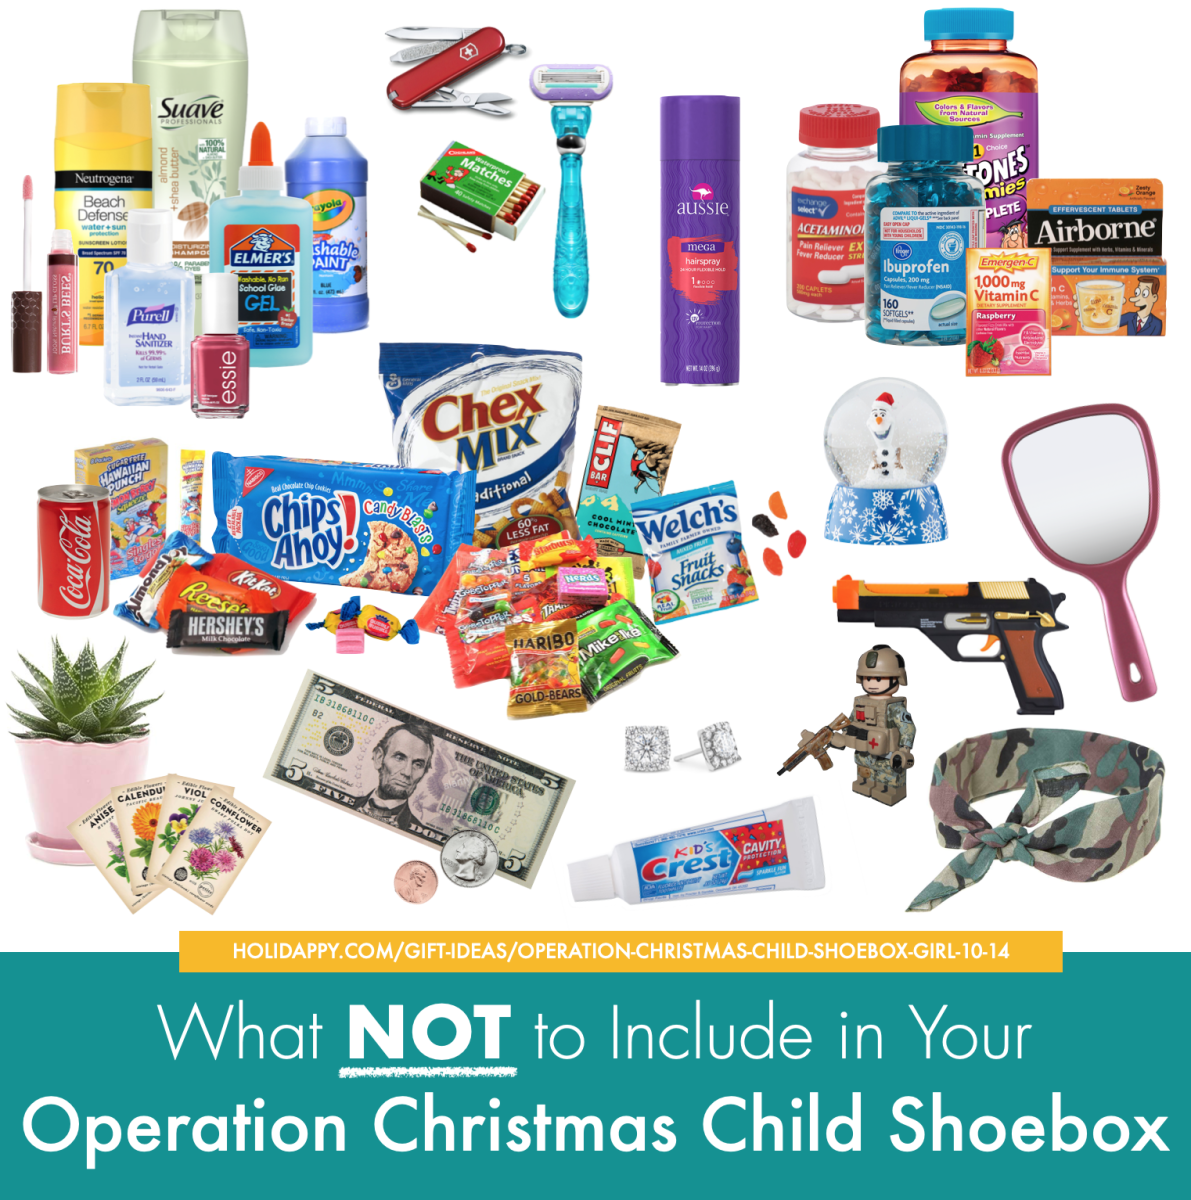 Christmas Shoebox Project 2021 Operation Christmas Child Life Changing Shoebox Ideas For A 10 14 Girl Holidappy